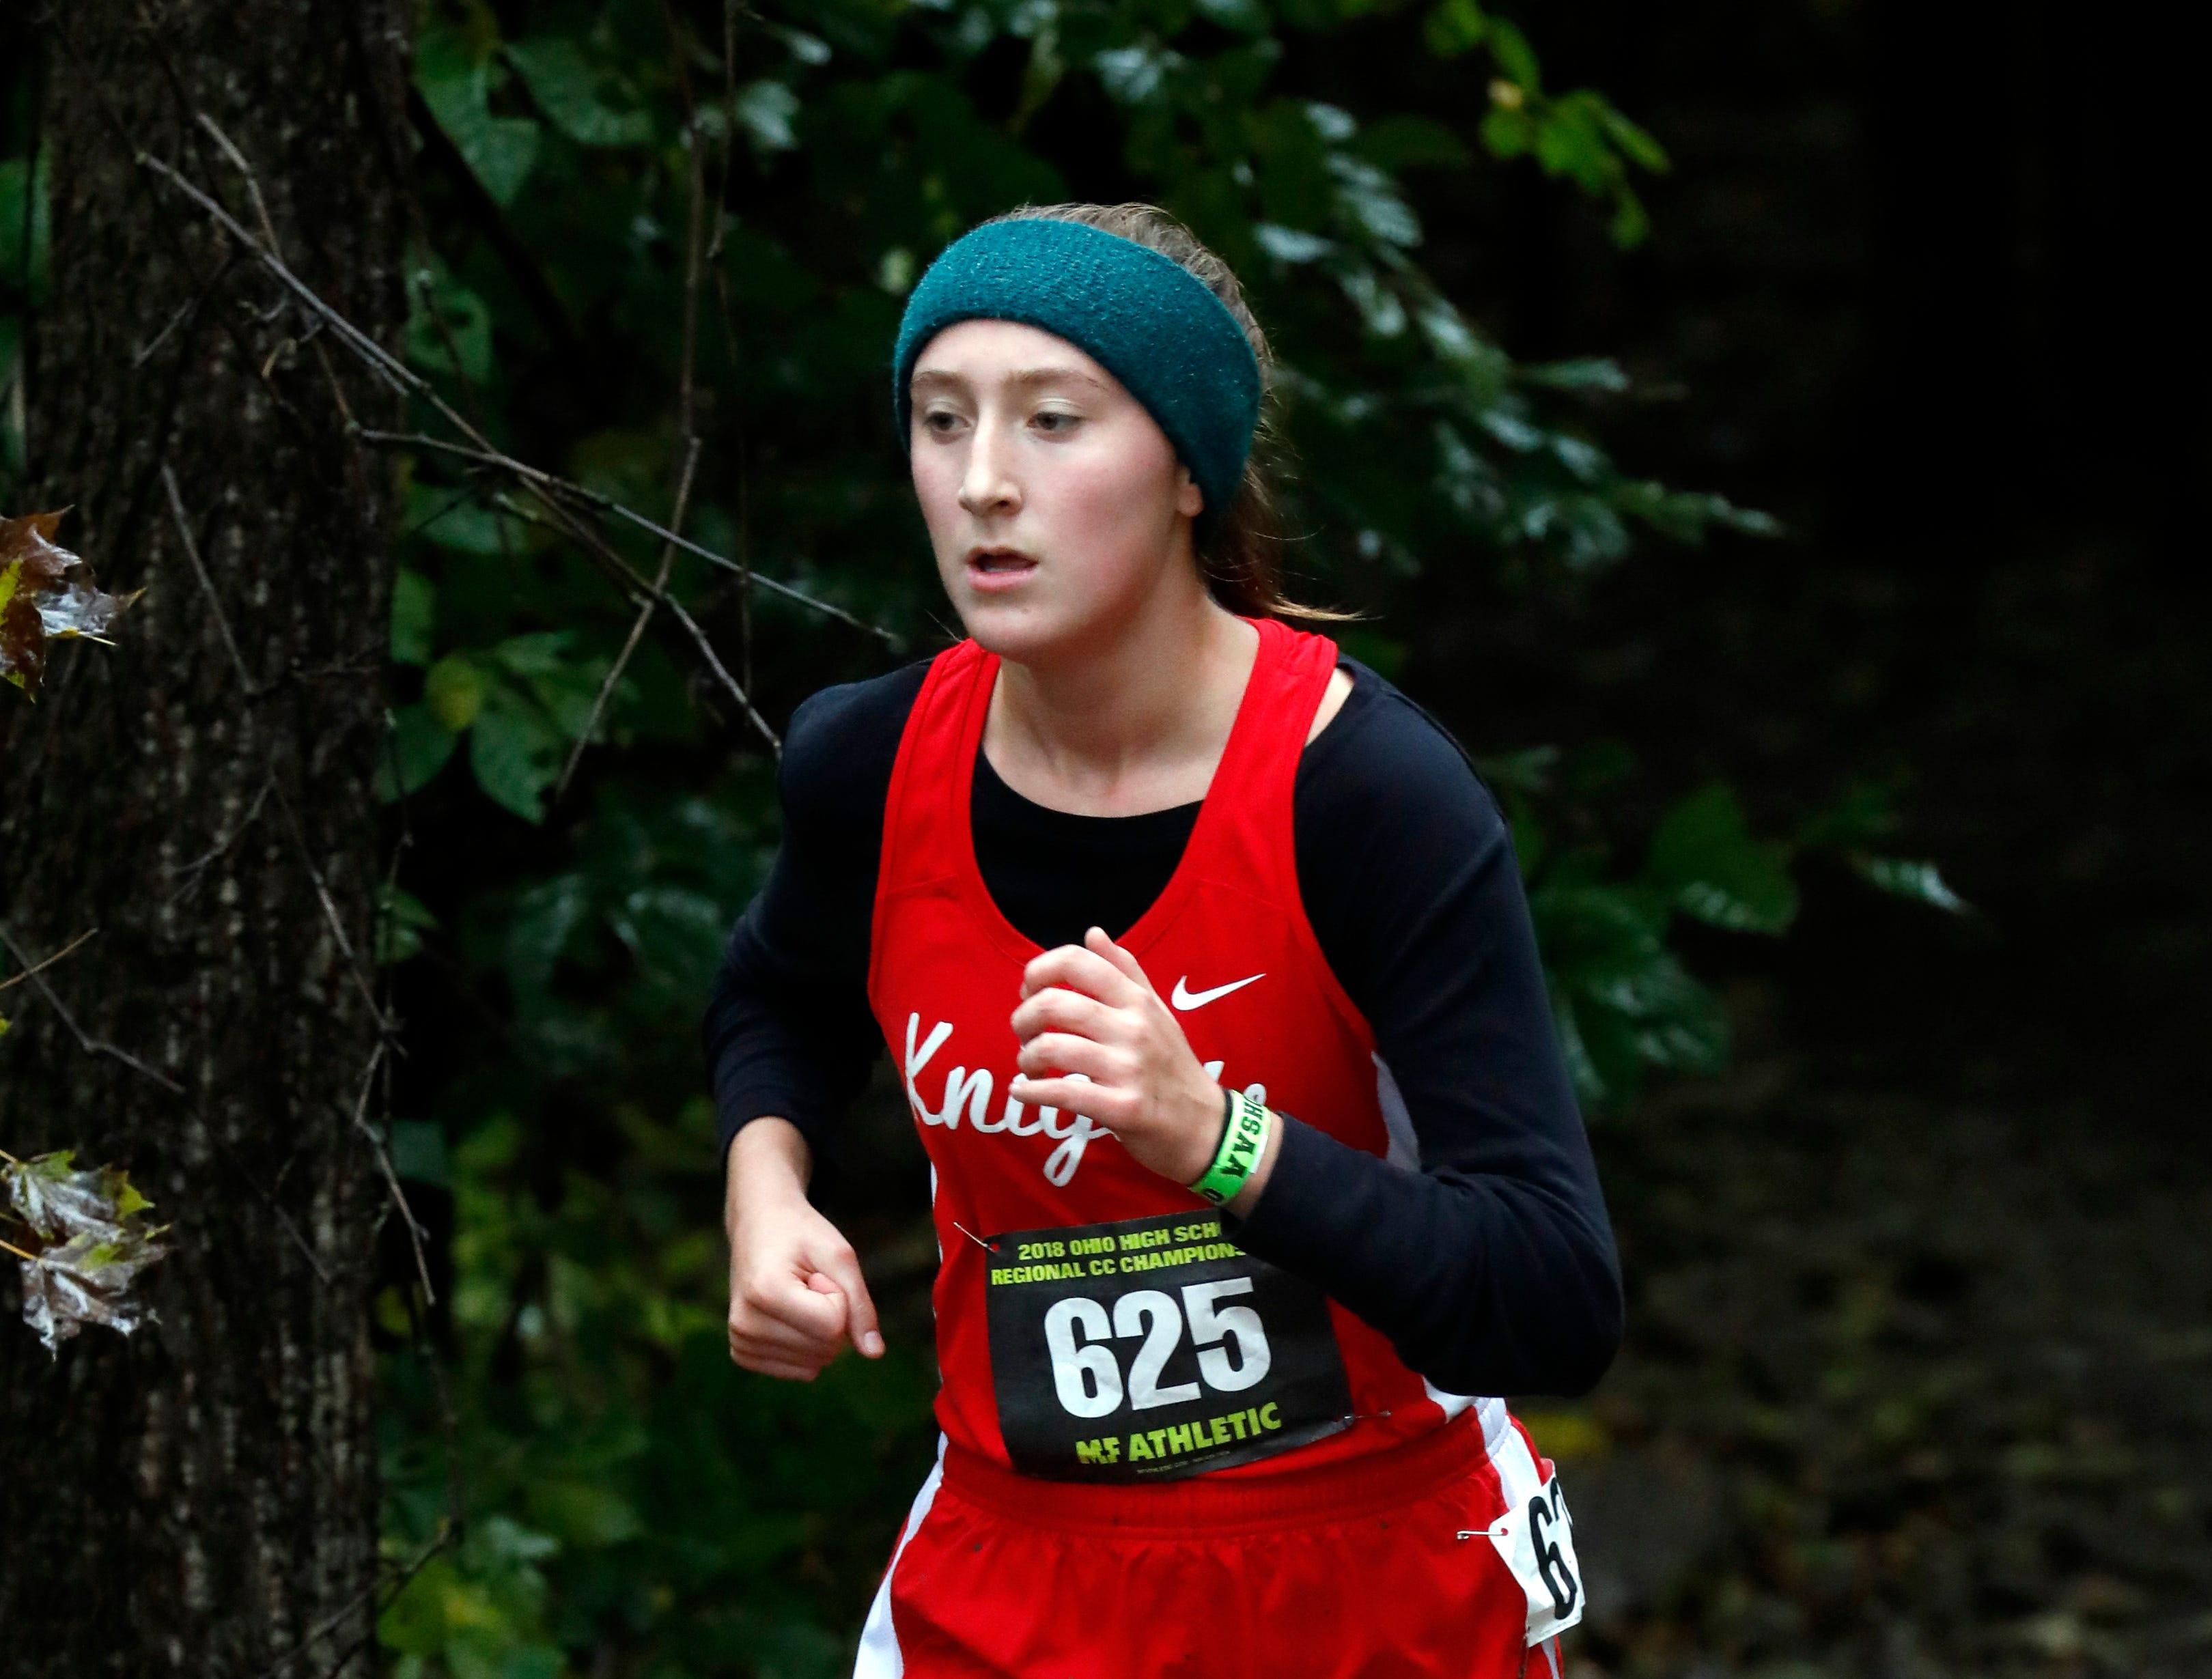 Fairfield Christian's Sophia Kumler runs in the Regional Cross Country meet Saturday, Oct. 27, 2018, at Pickerington North High School in Pickerington.